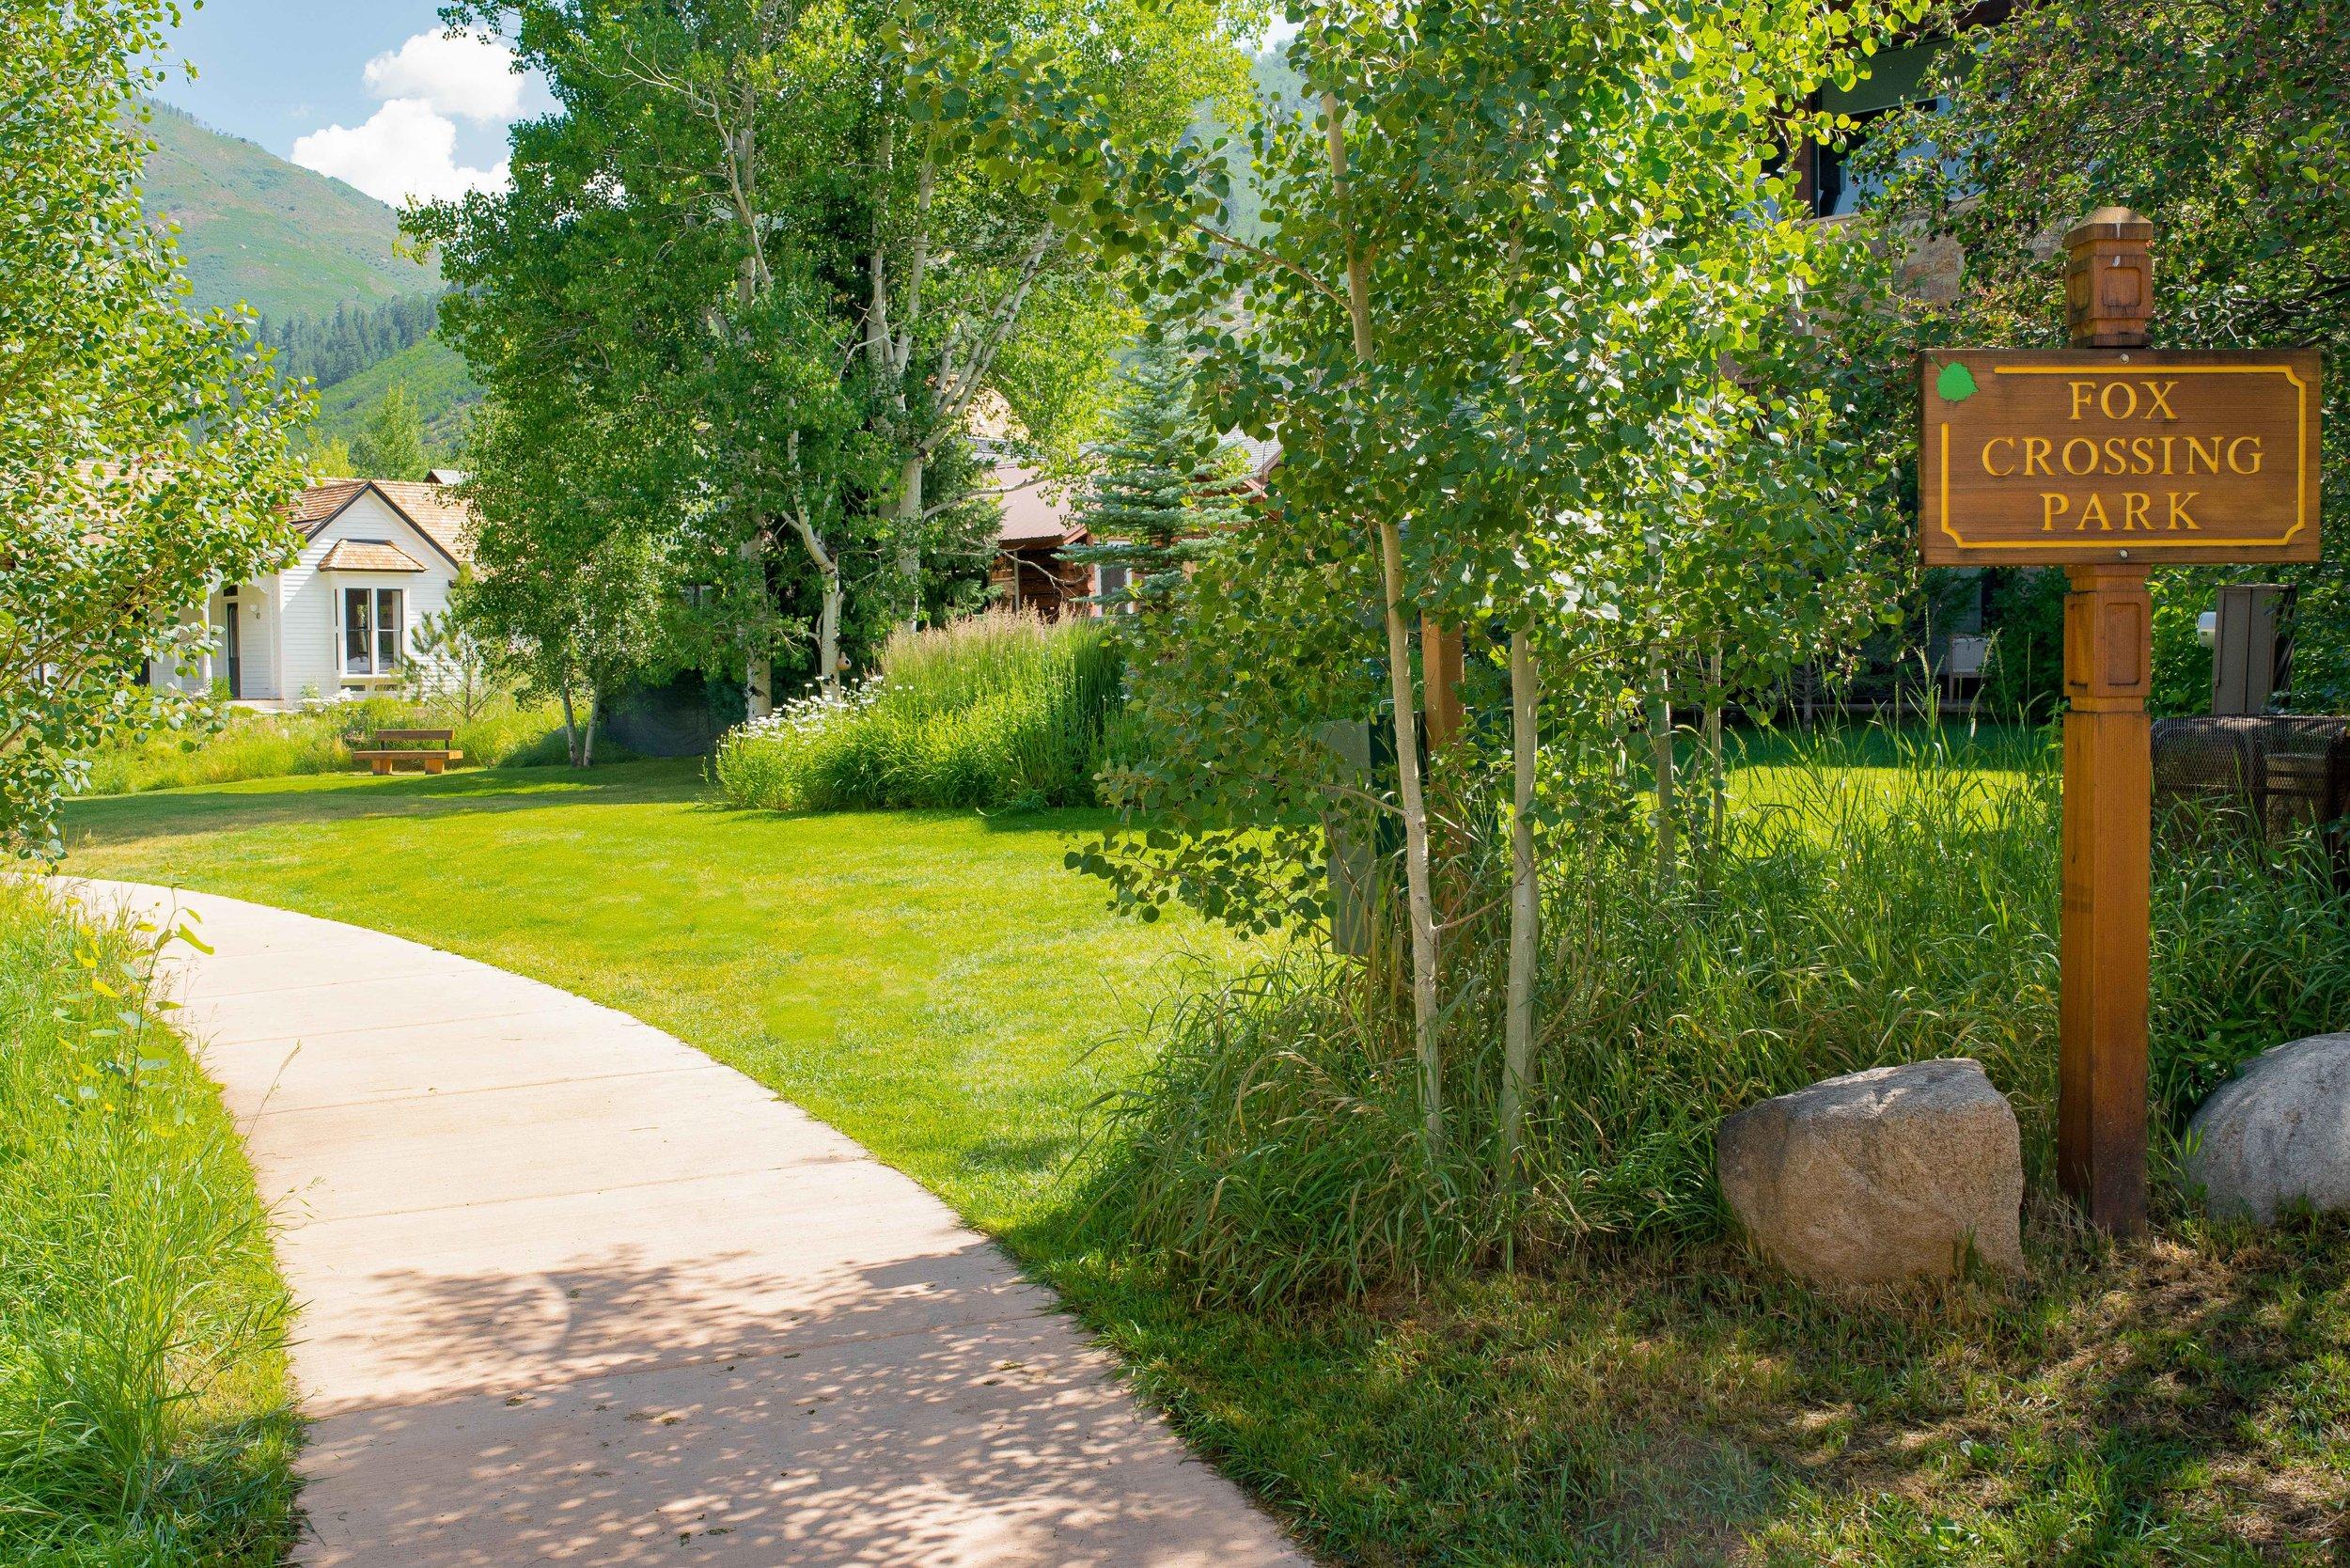 Aspen Fox Crossing Park Landscape